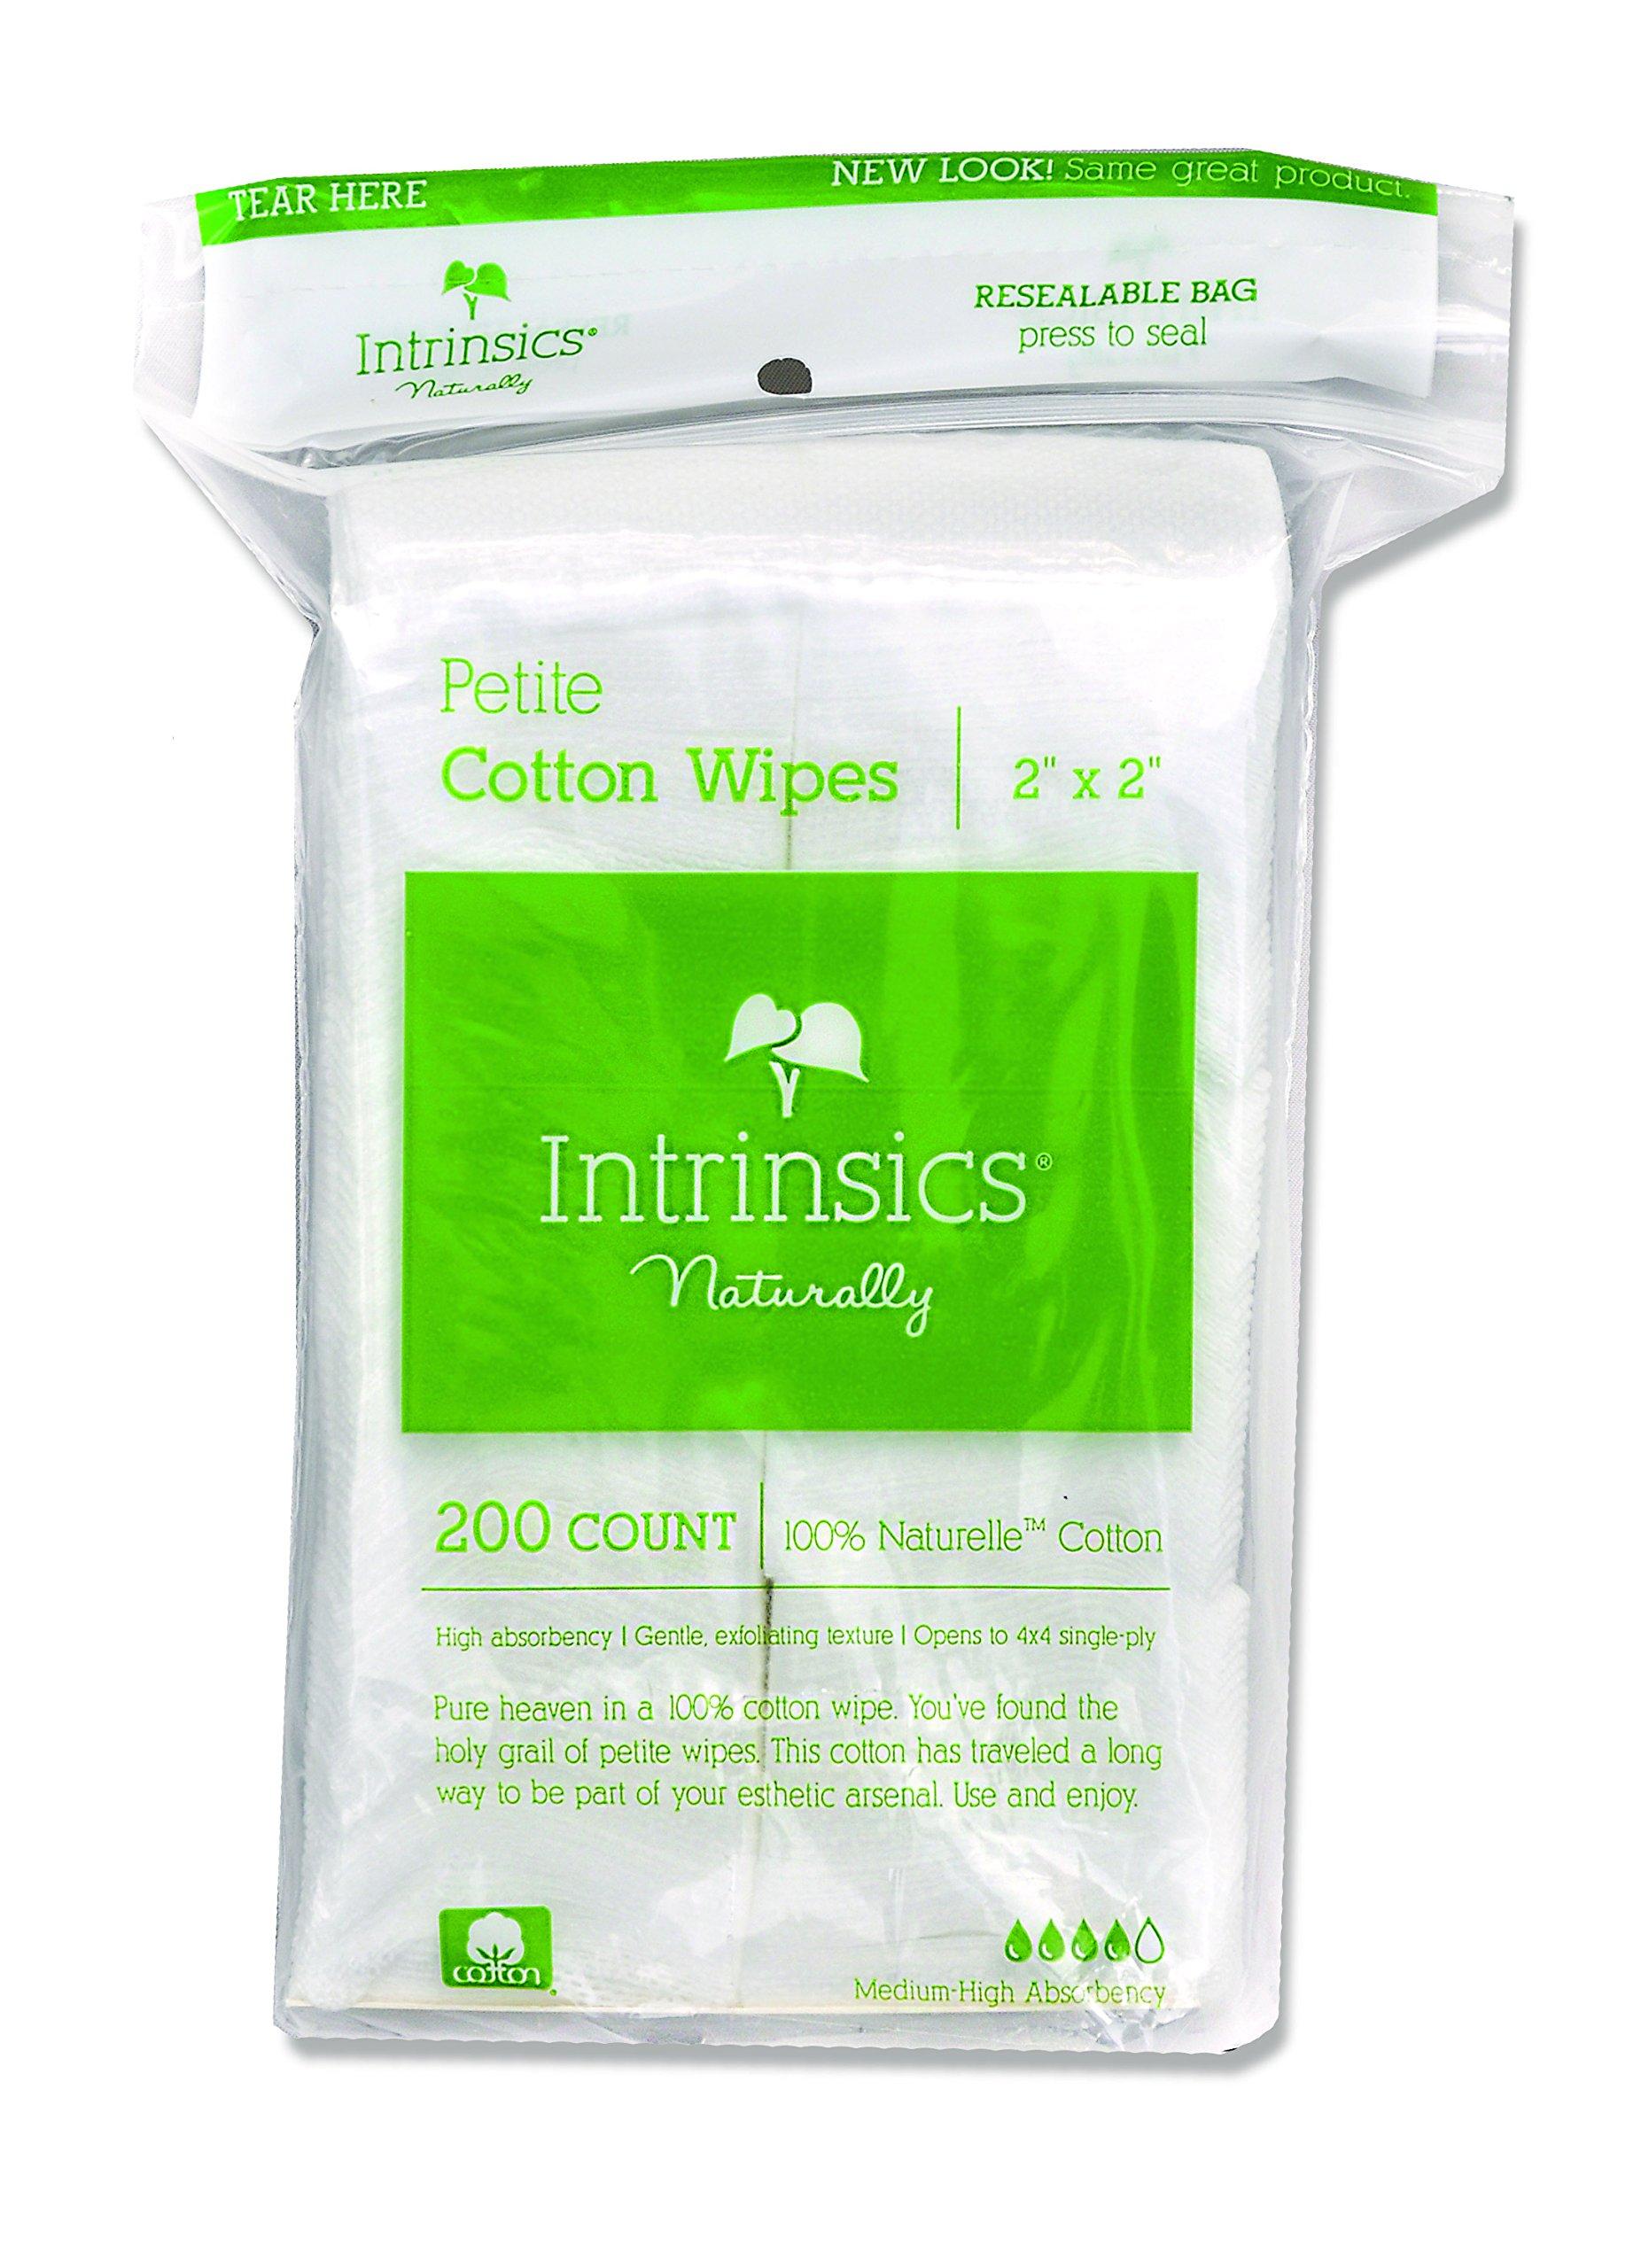 "Intrinsics Petite Cotton Wipes - 2""x2"", 4-ply 100% Cotton, 200 Count"